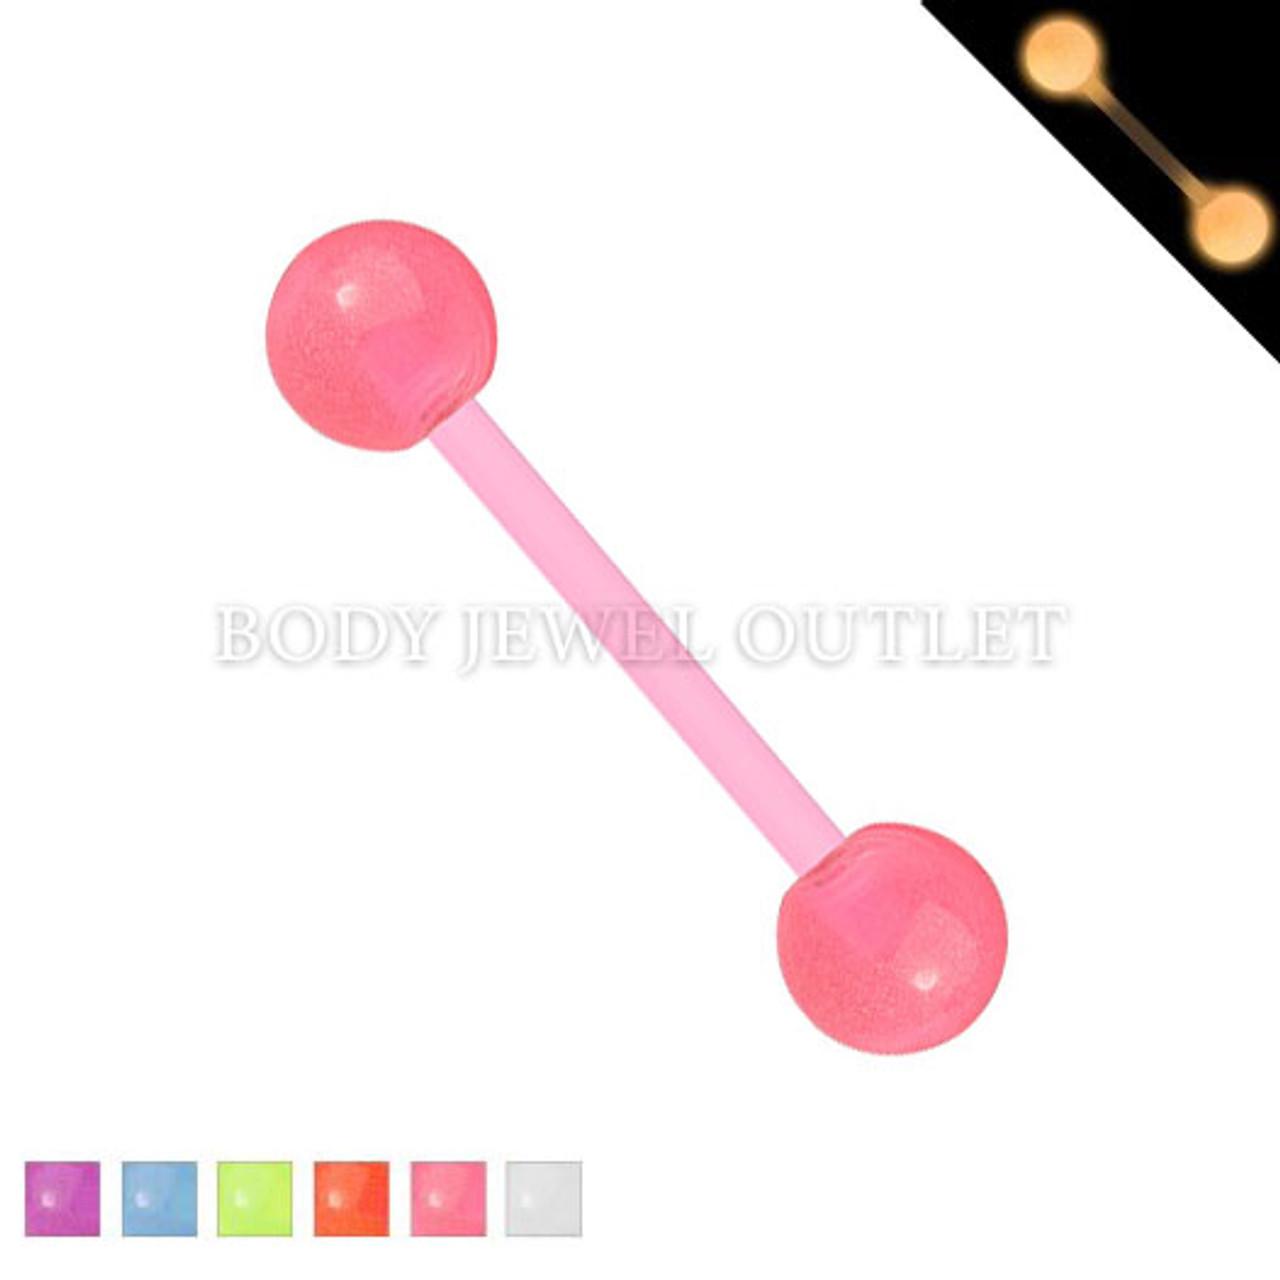 Bio Flex Tongue Piercing Pink Glow in Dark   BodyJewelOutlet